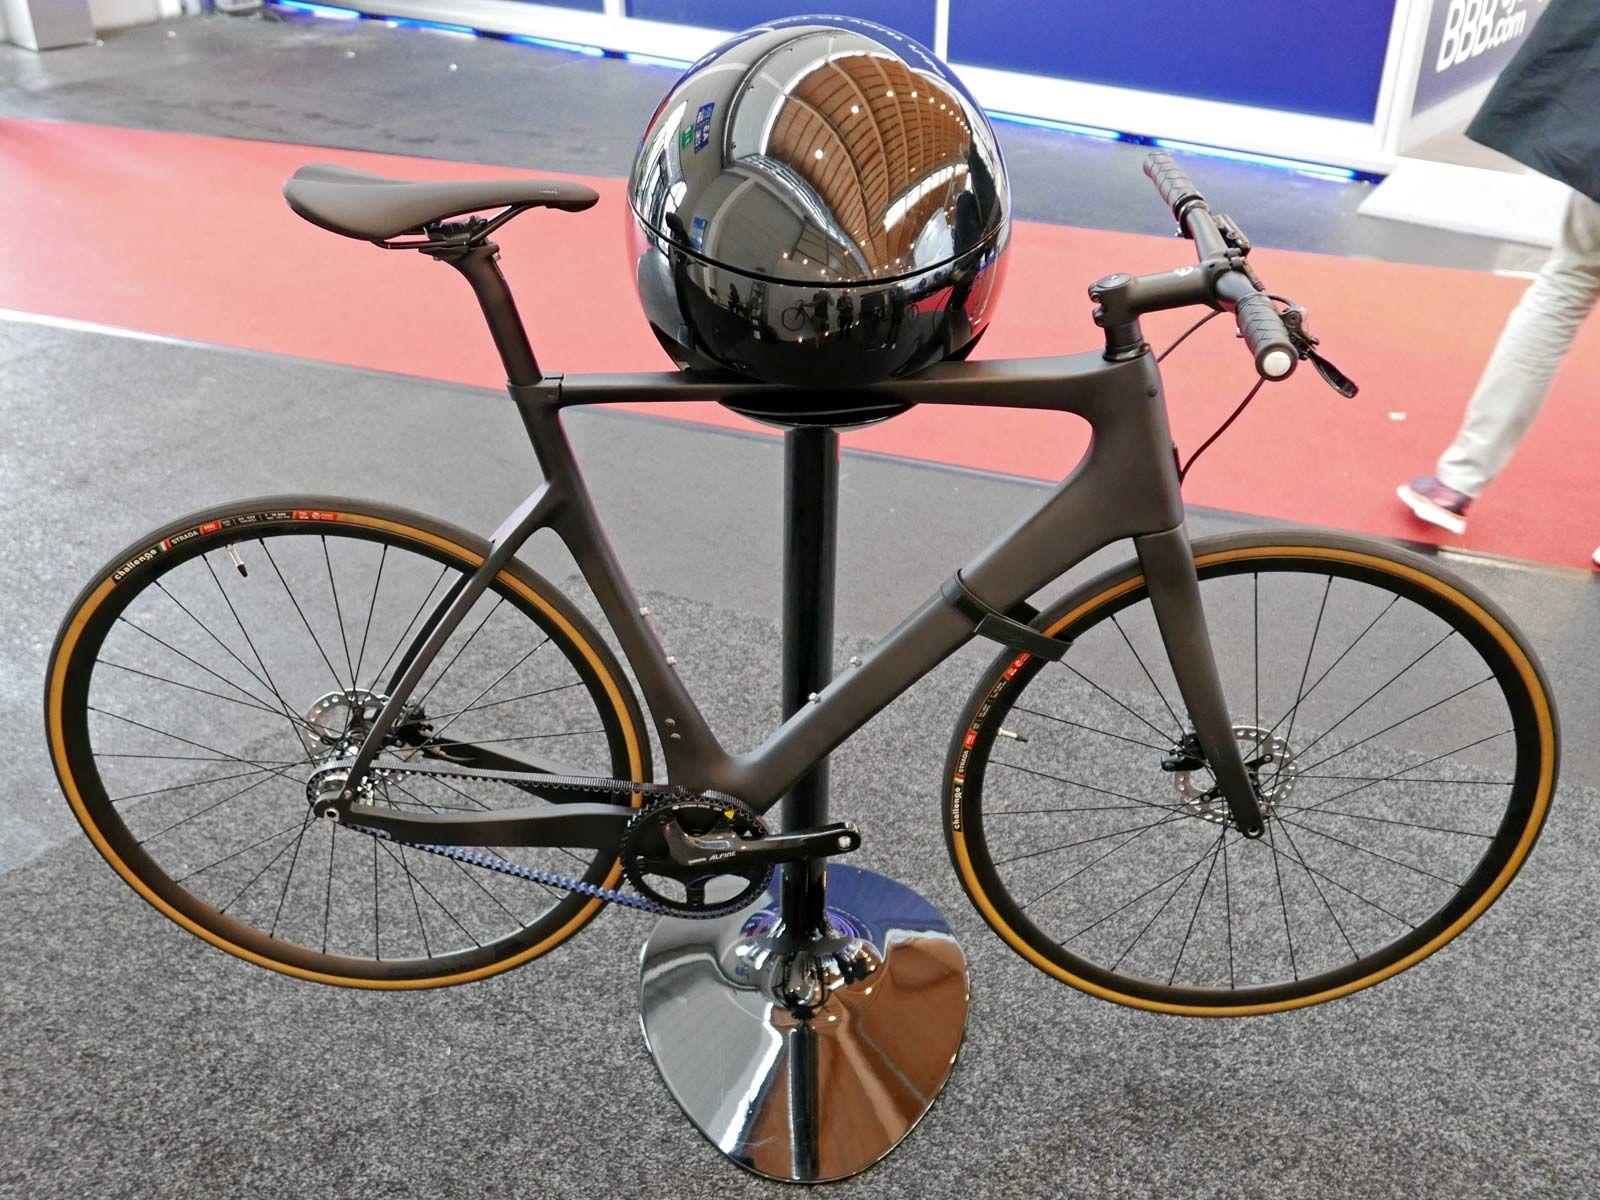 FABike C3 third generation carbon flexible adjustable bike belt-drive  compatible disc brake road gravel cross bike flat-bar urban Gates  singlespeed ... 7266c7192